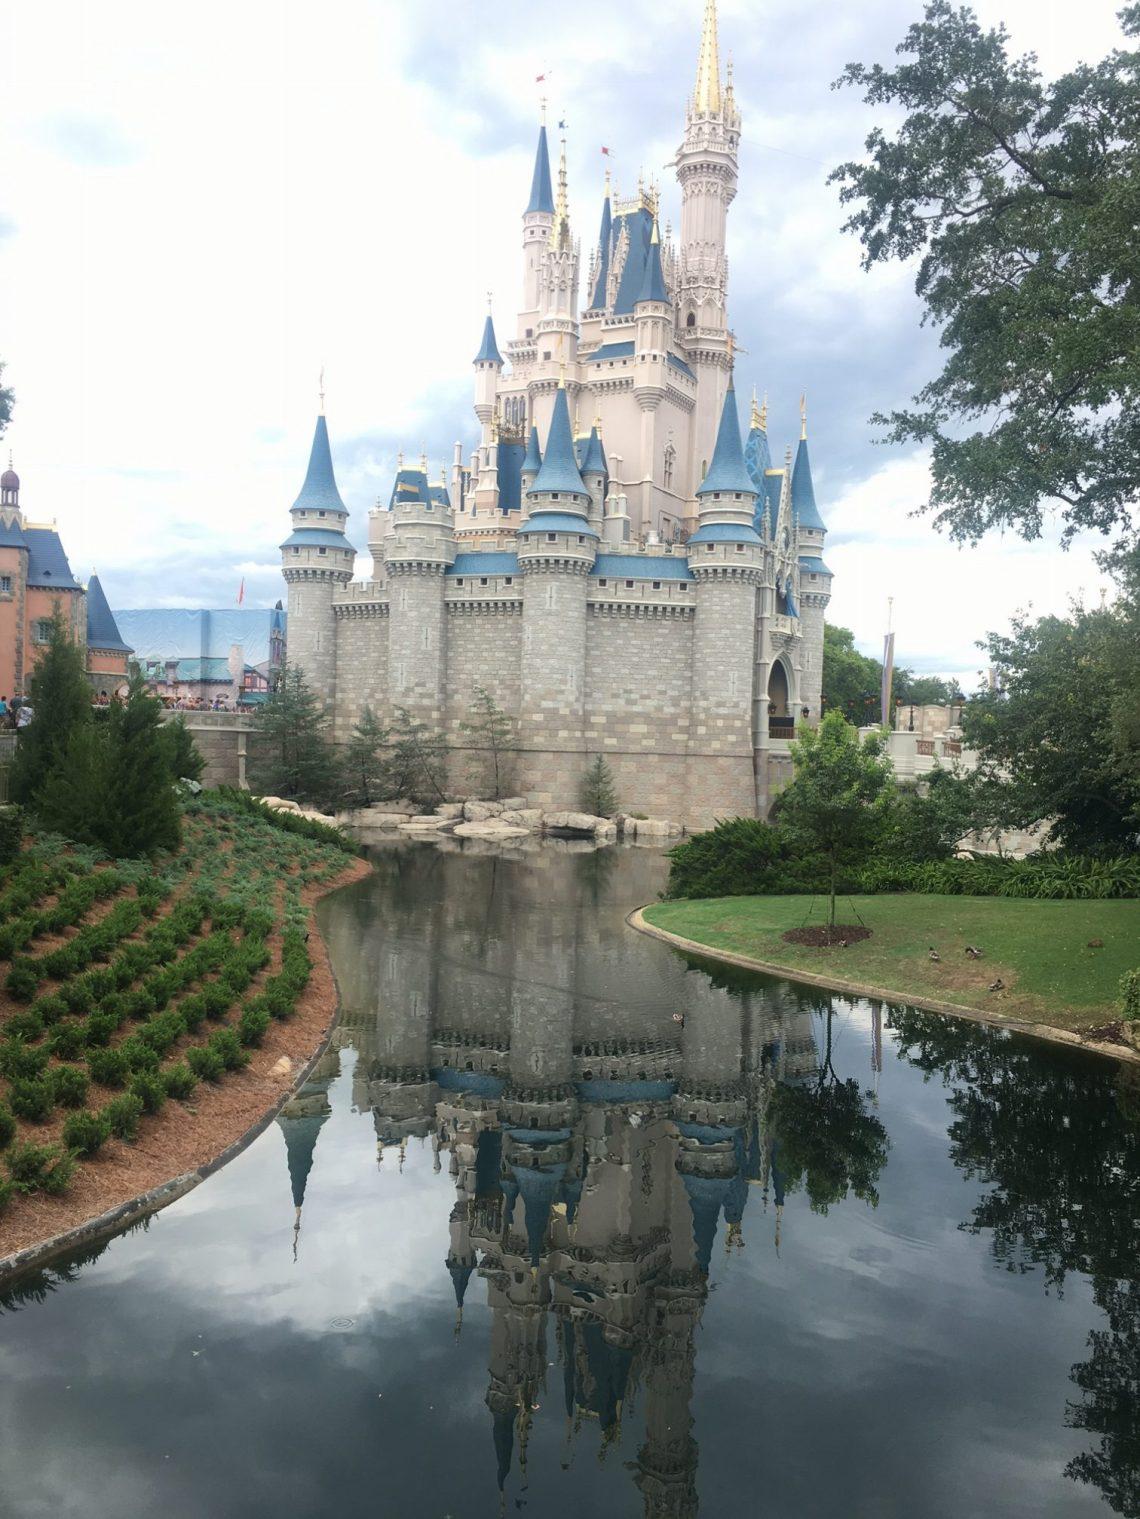 Castle at the Magic Kingdom